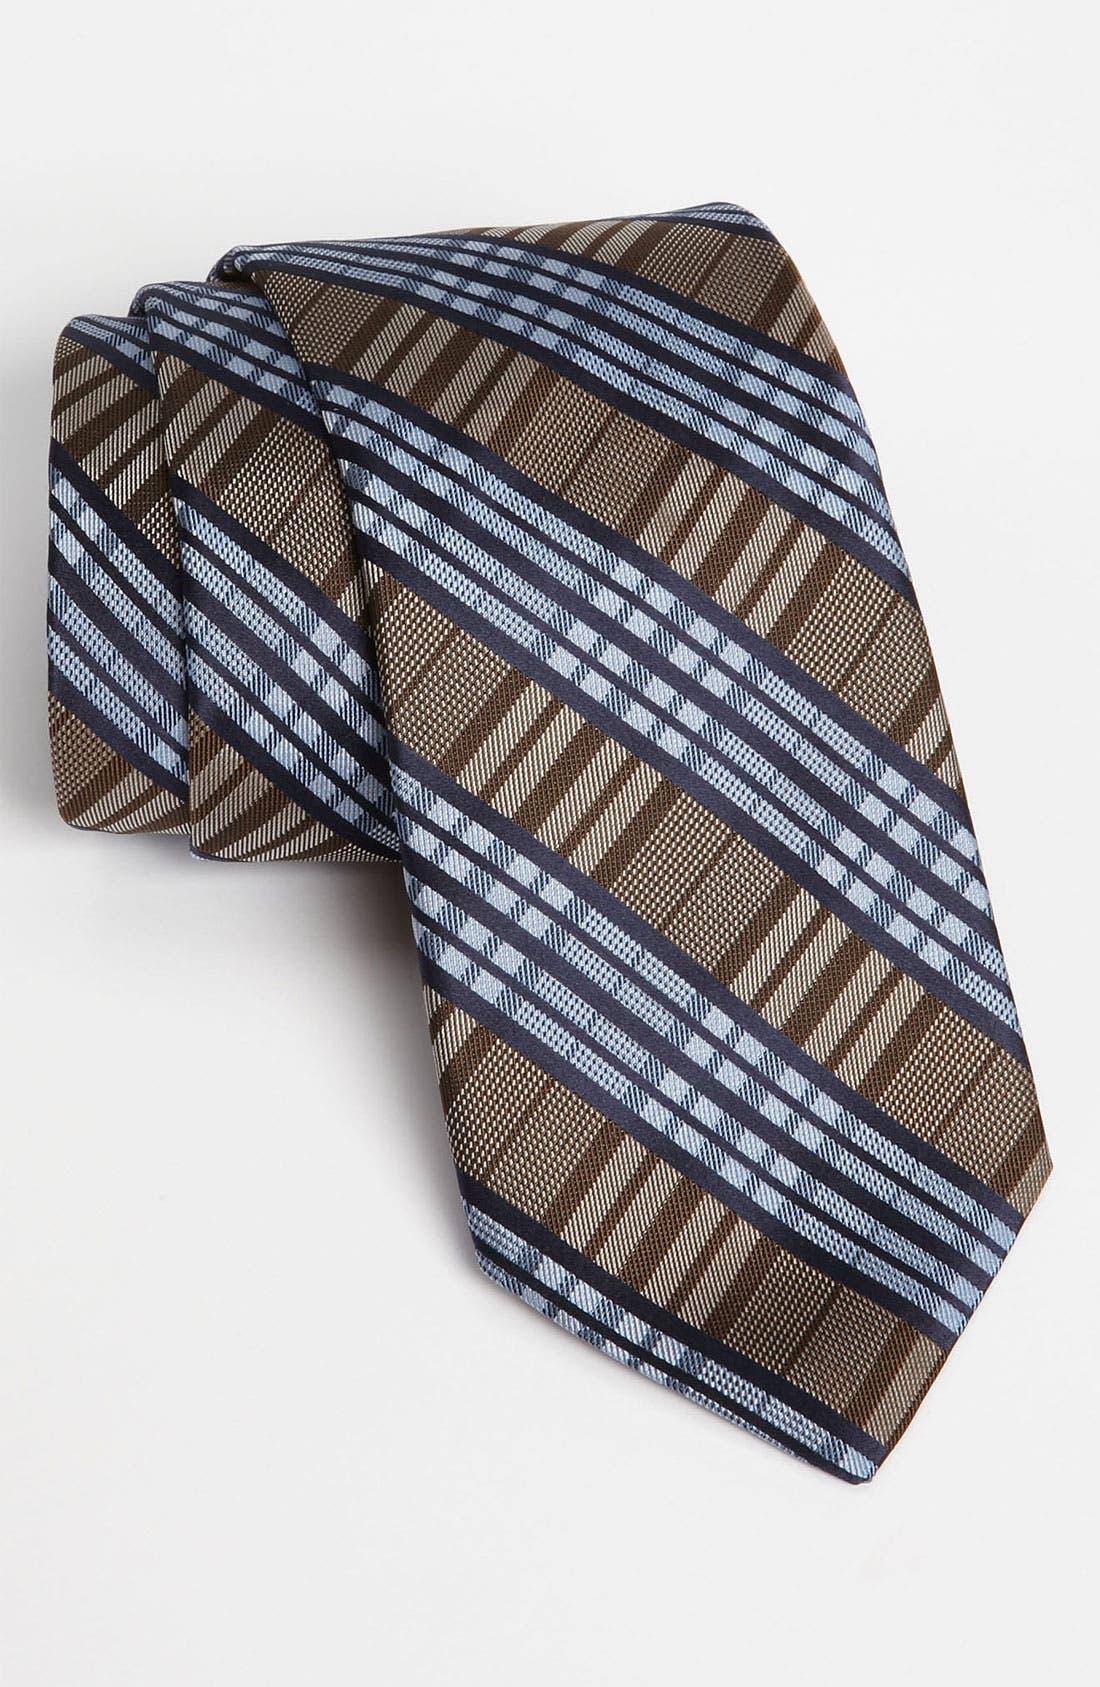 Alternate Image 1 Selected - John W. Nordstrom® Woven Tie